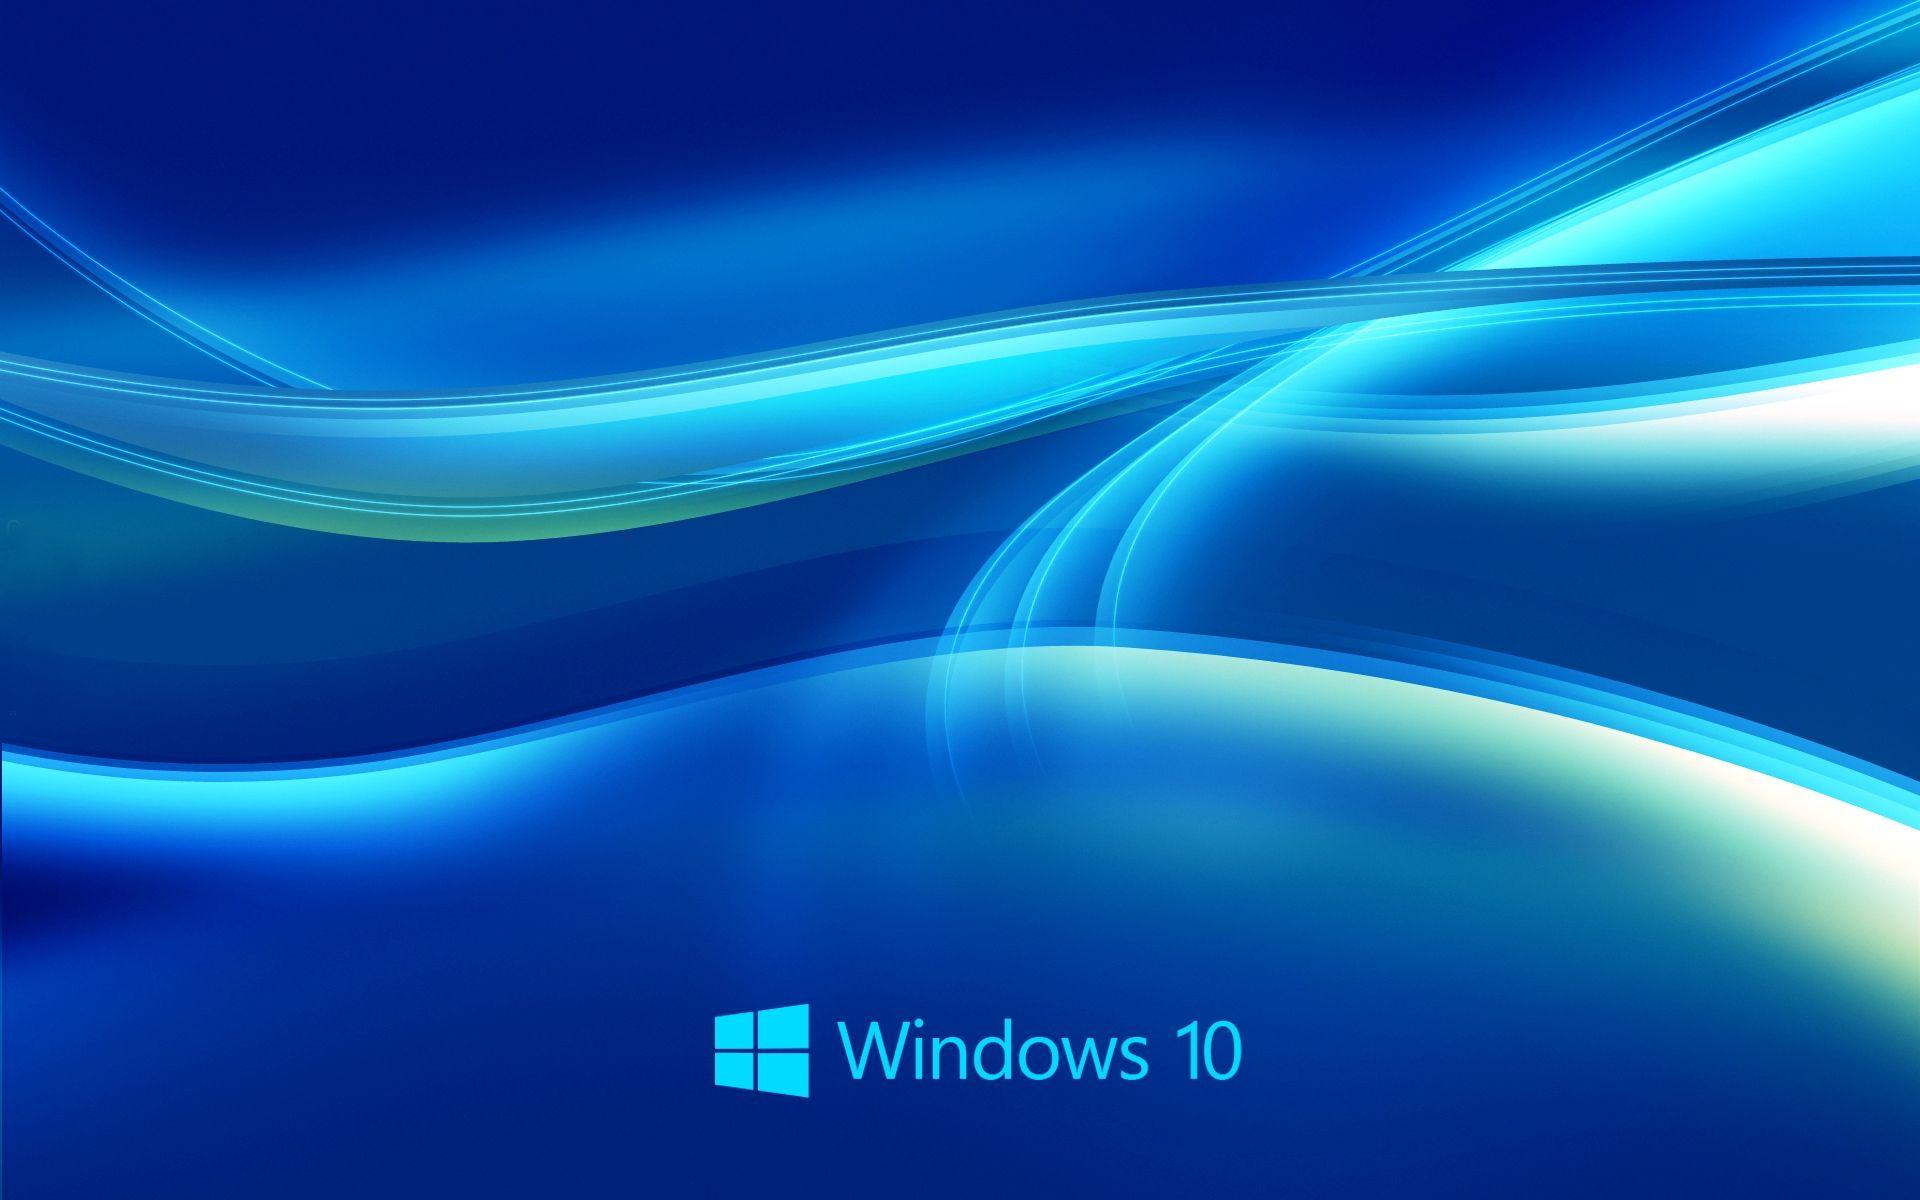 Windows 10 Graphics Hd Wallpaper Wallpaper Windows 10 Windows 10 Desktop Backgrounds Windows 10